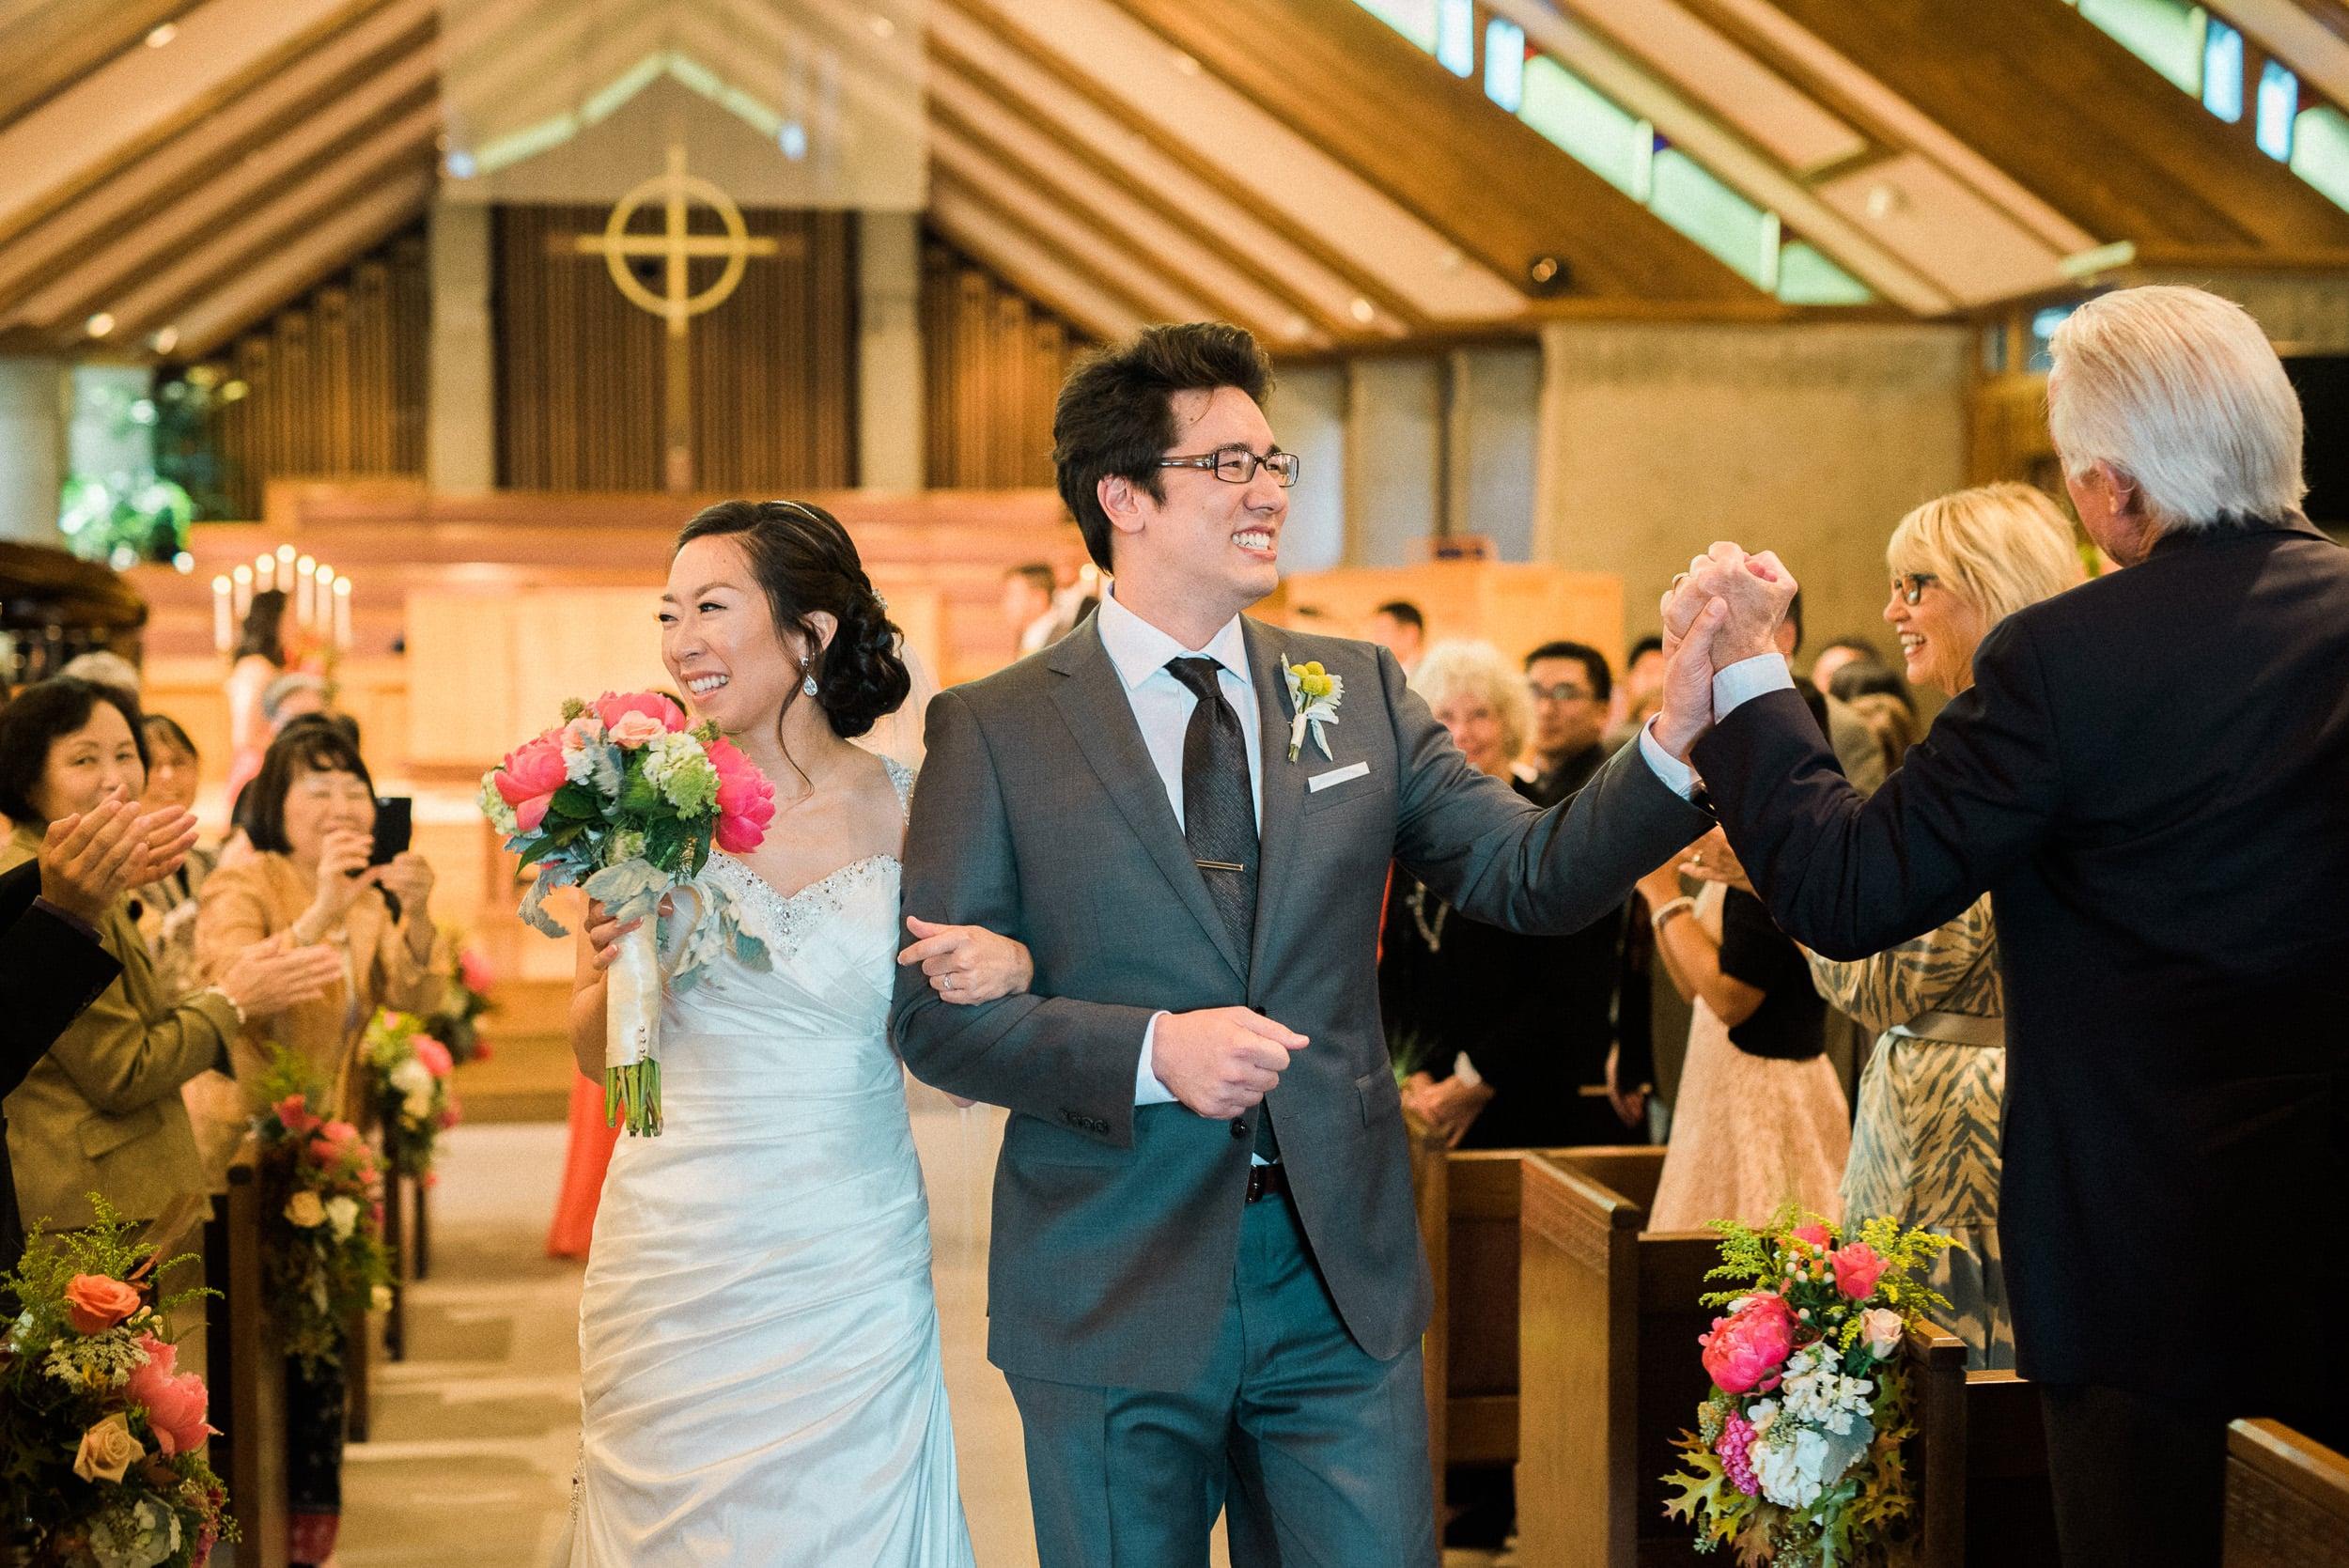 Moraga Valley Church wedding 054.jpg